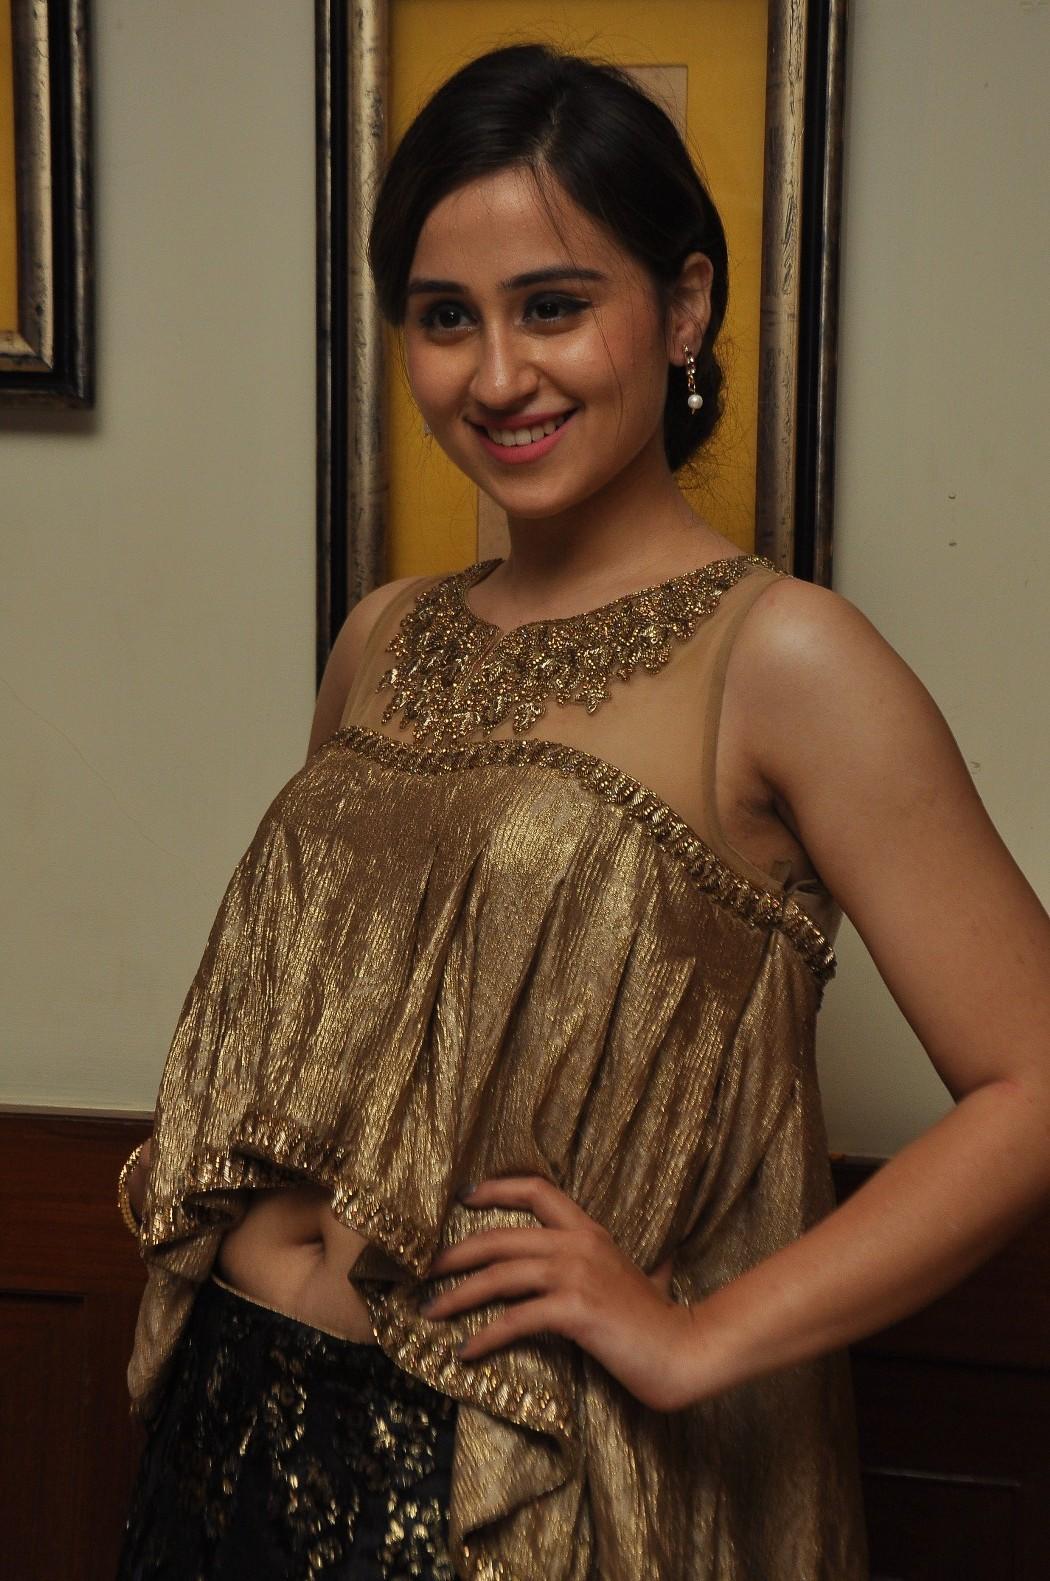 Love For Handloom Celebs and Models Dazzle In Elegant Outfit   Love For Handloom Praneetha Love For Handloom 493